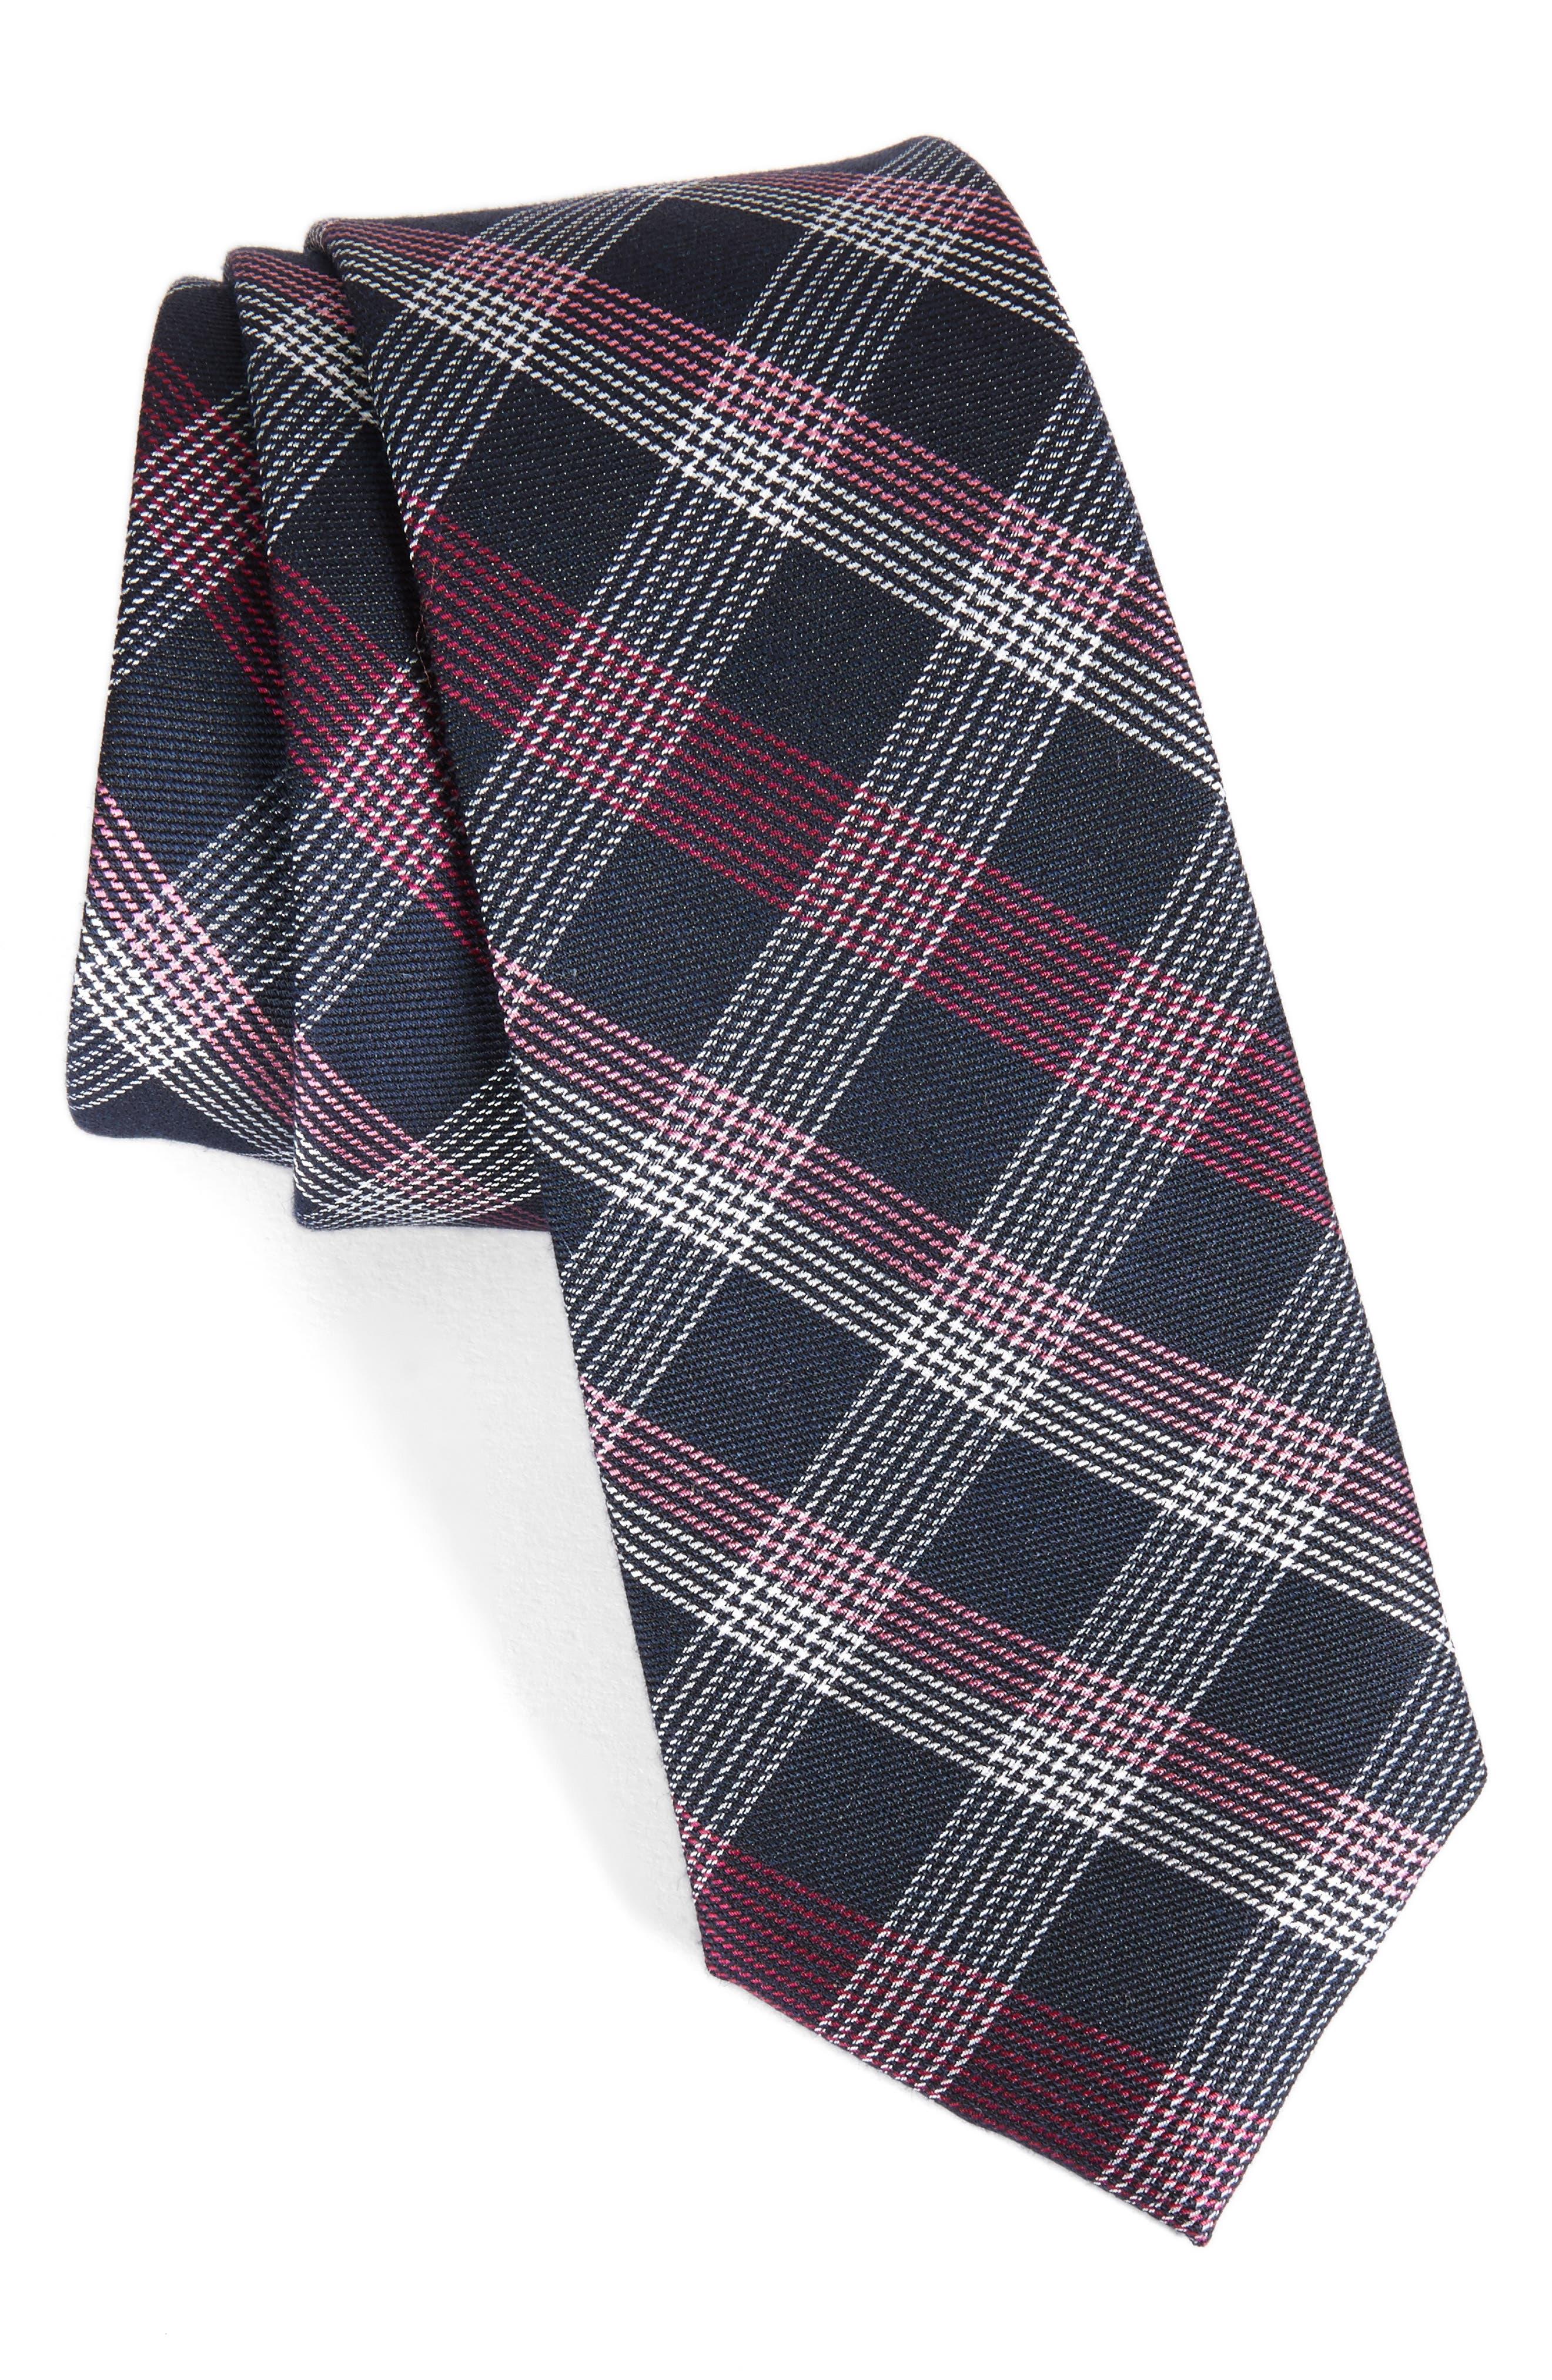 Main Image - Calibrate Indigo Plaid Silk Tie